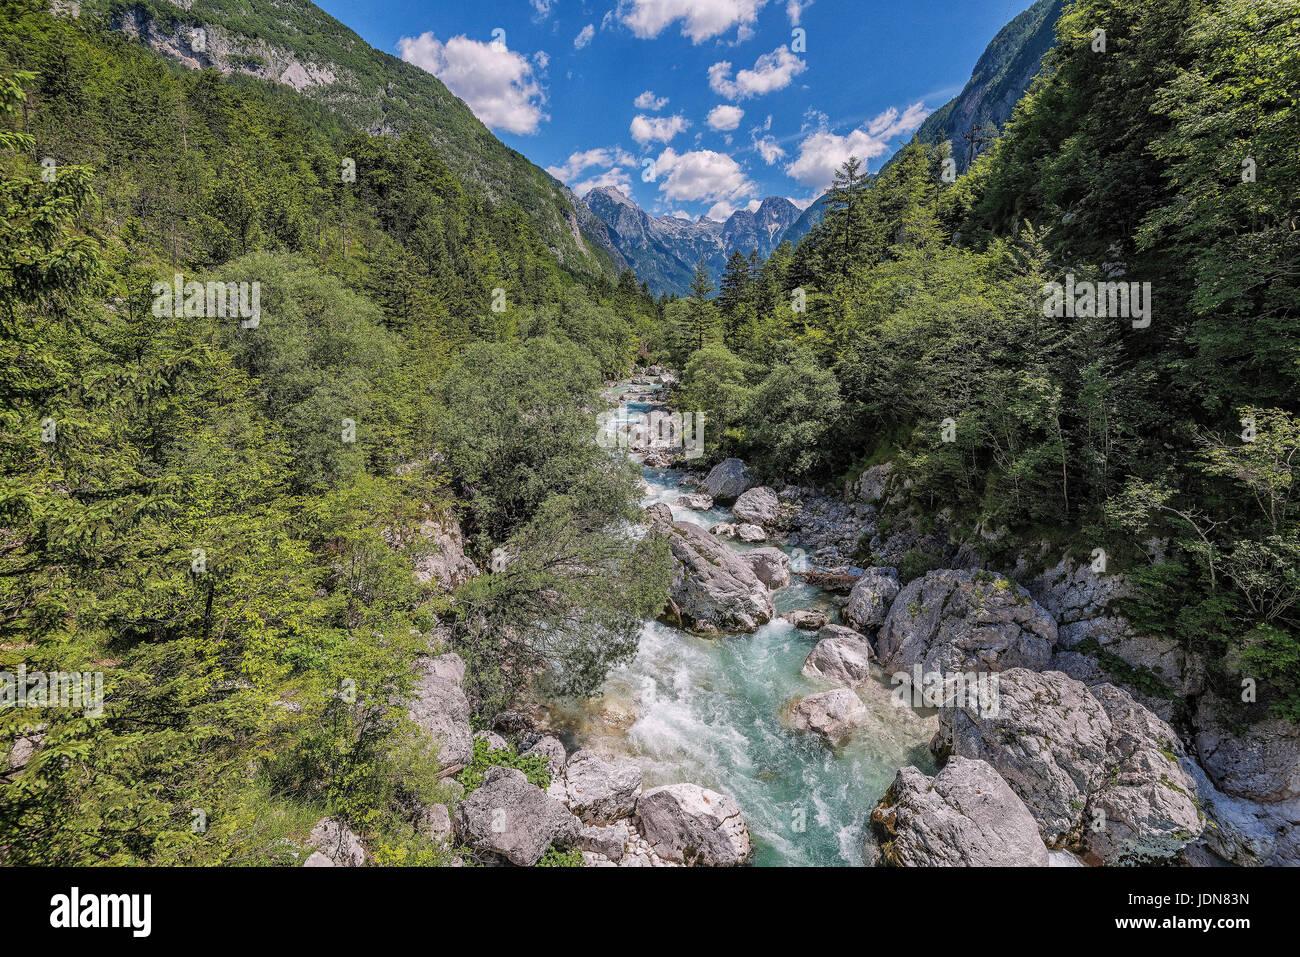 Soca, Slovenien, NP Triglav - Stock Image